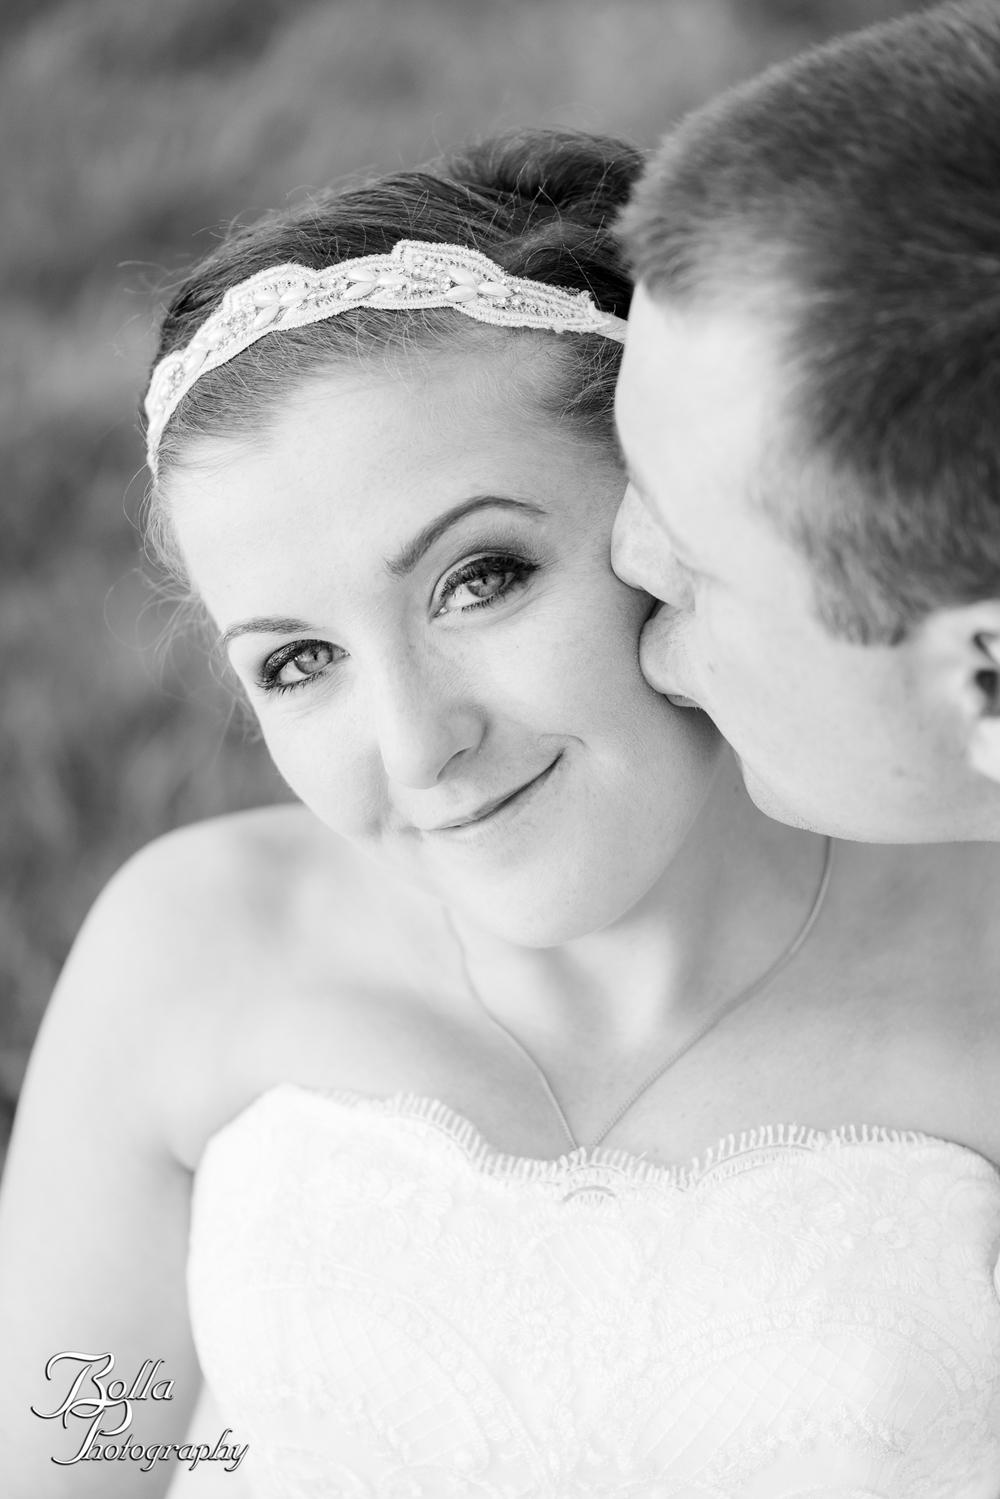 Bolla_Photography_St_Louis_wedding_photographer-2-5.jpg